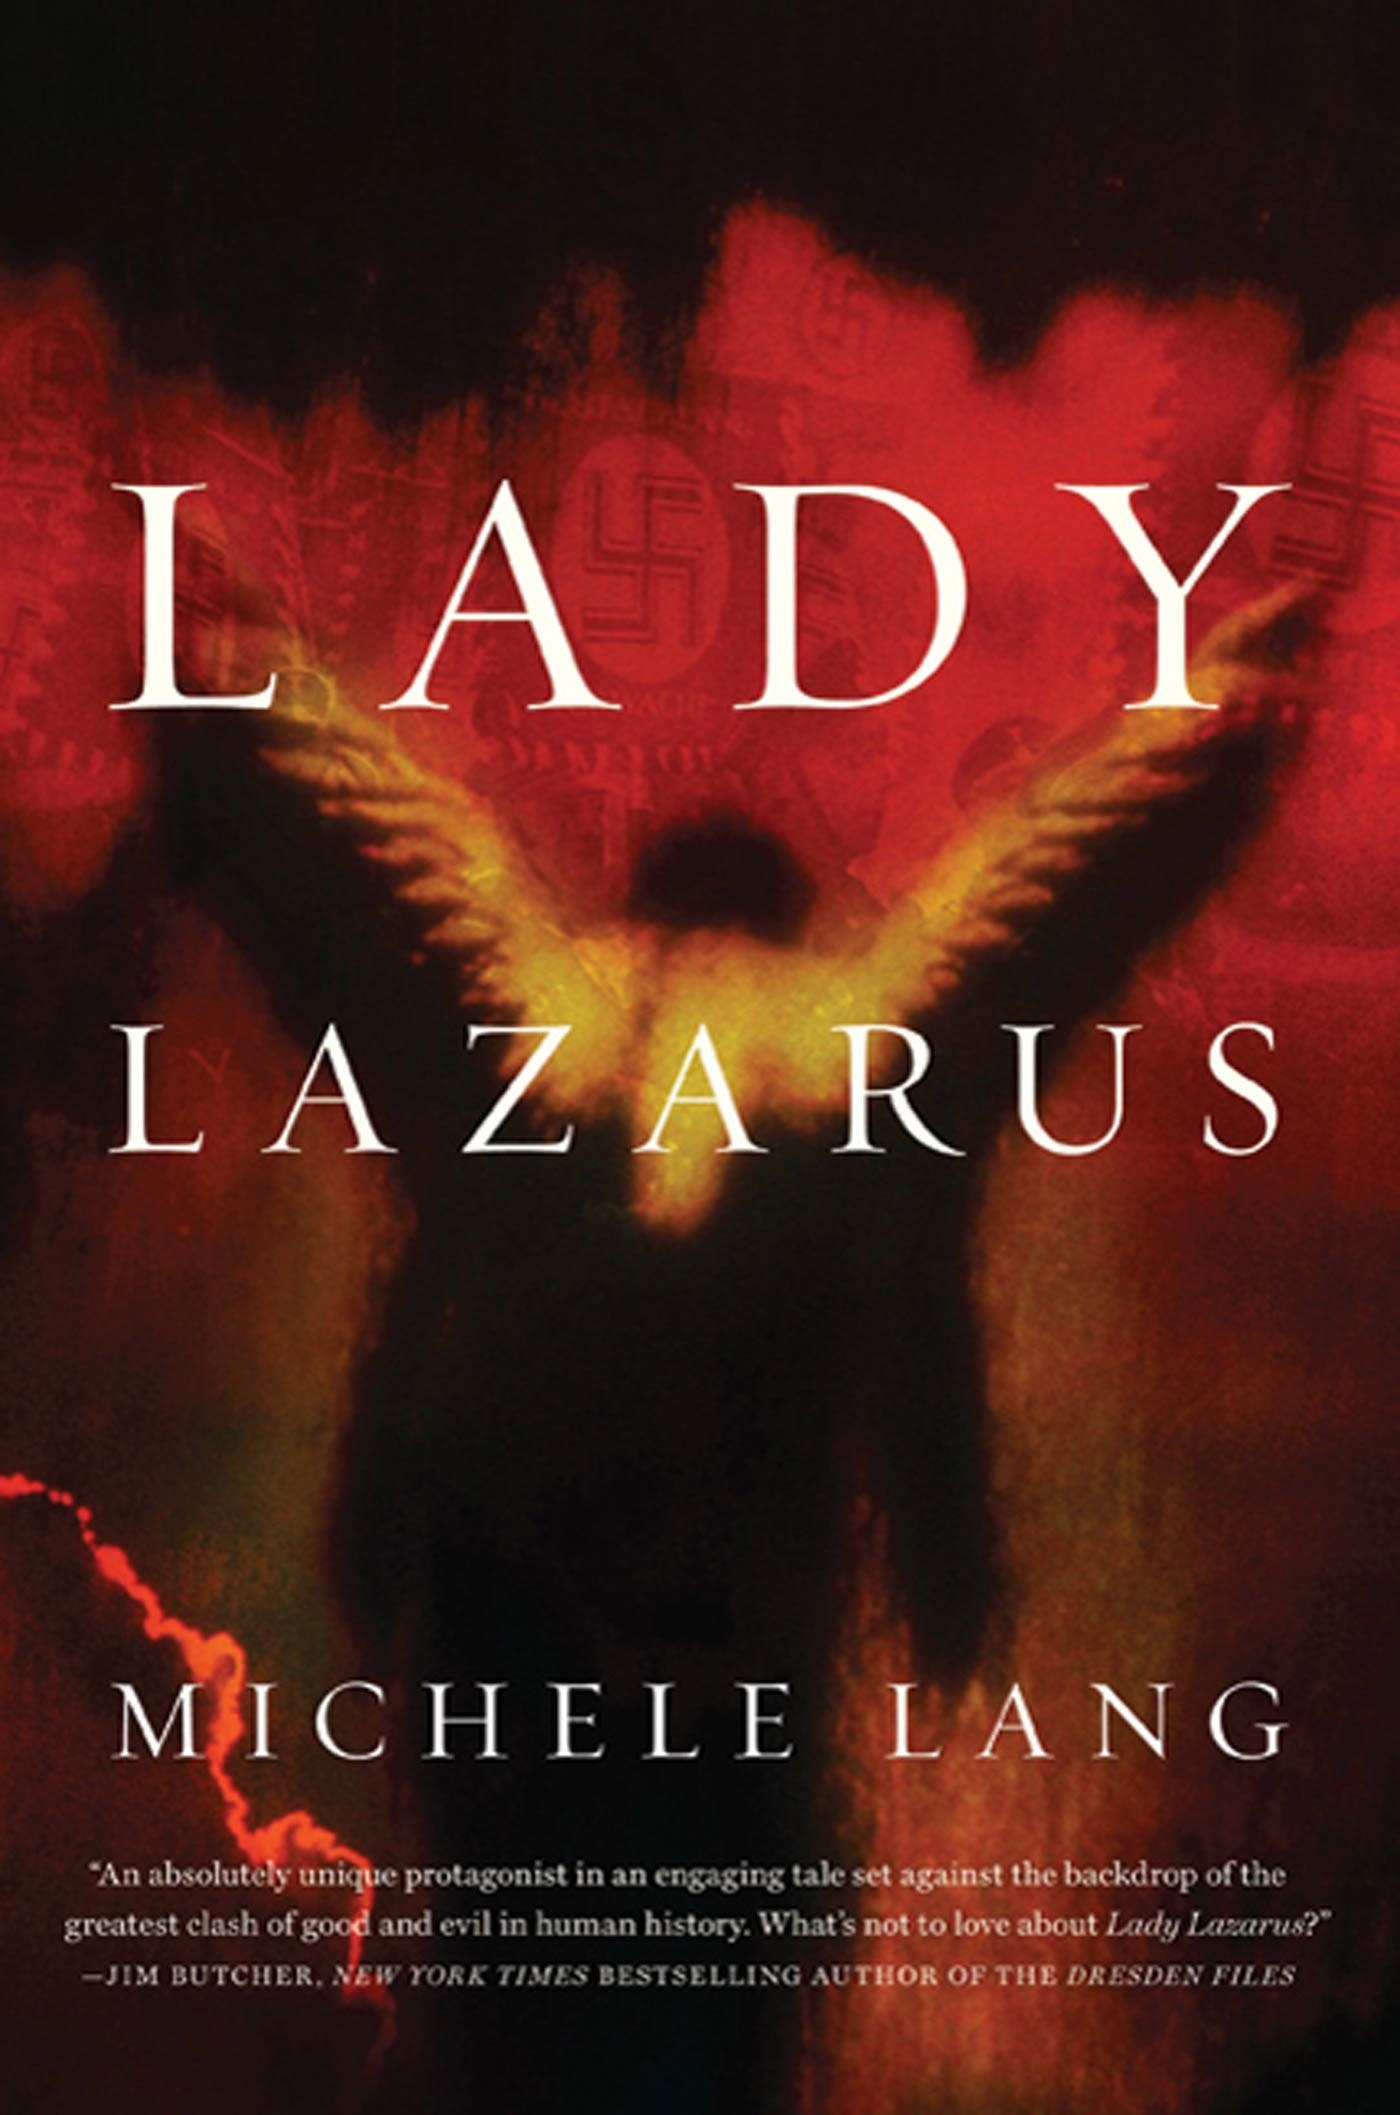 Image of Lady Lazarus